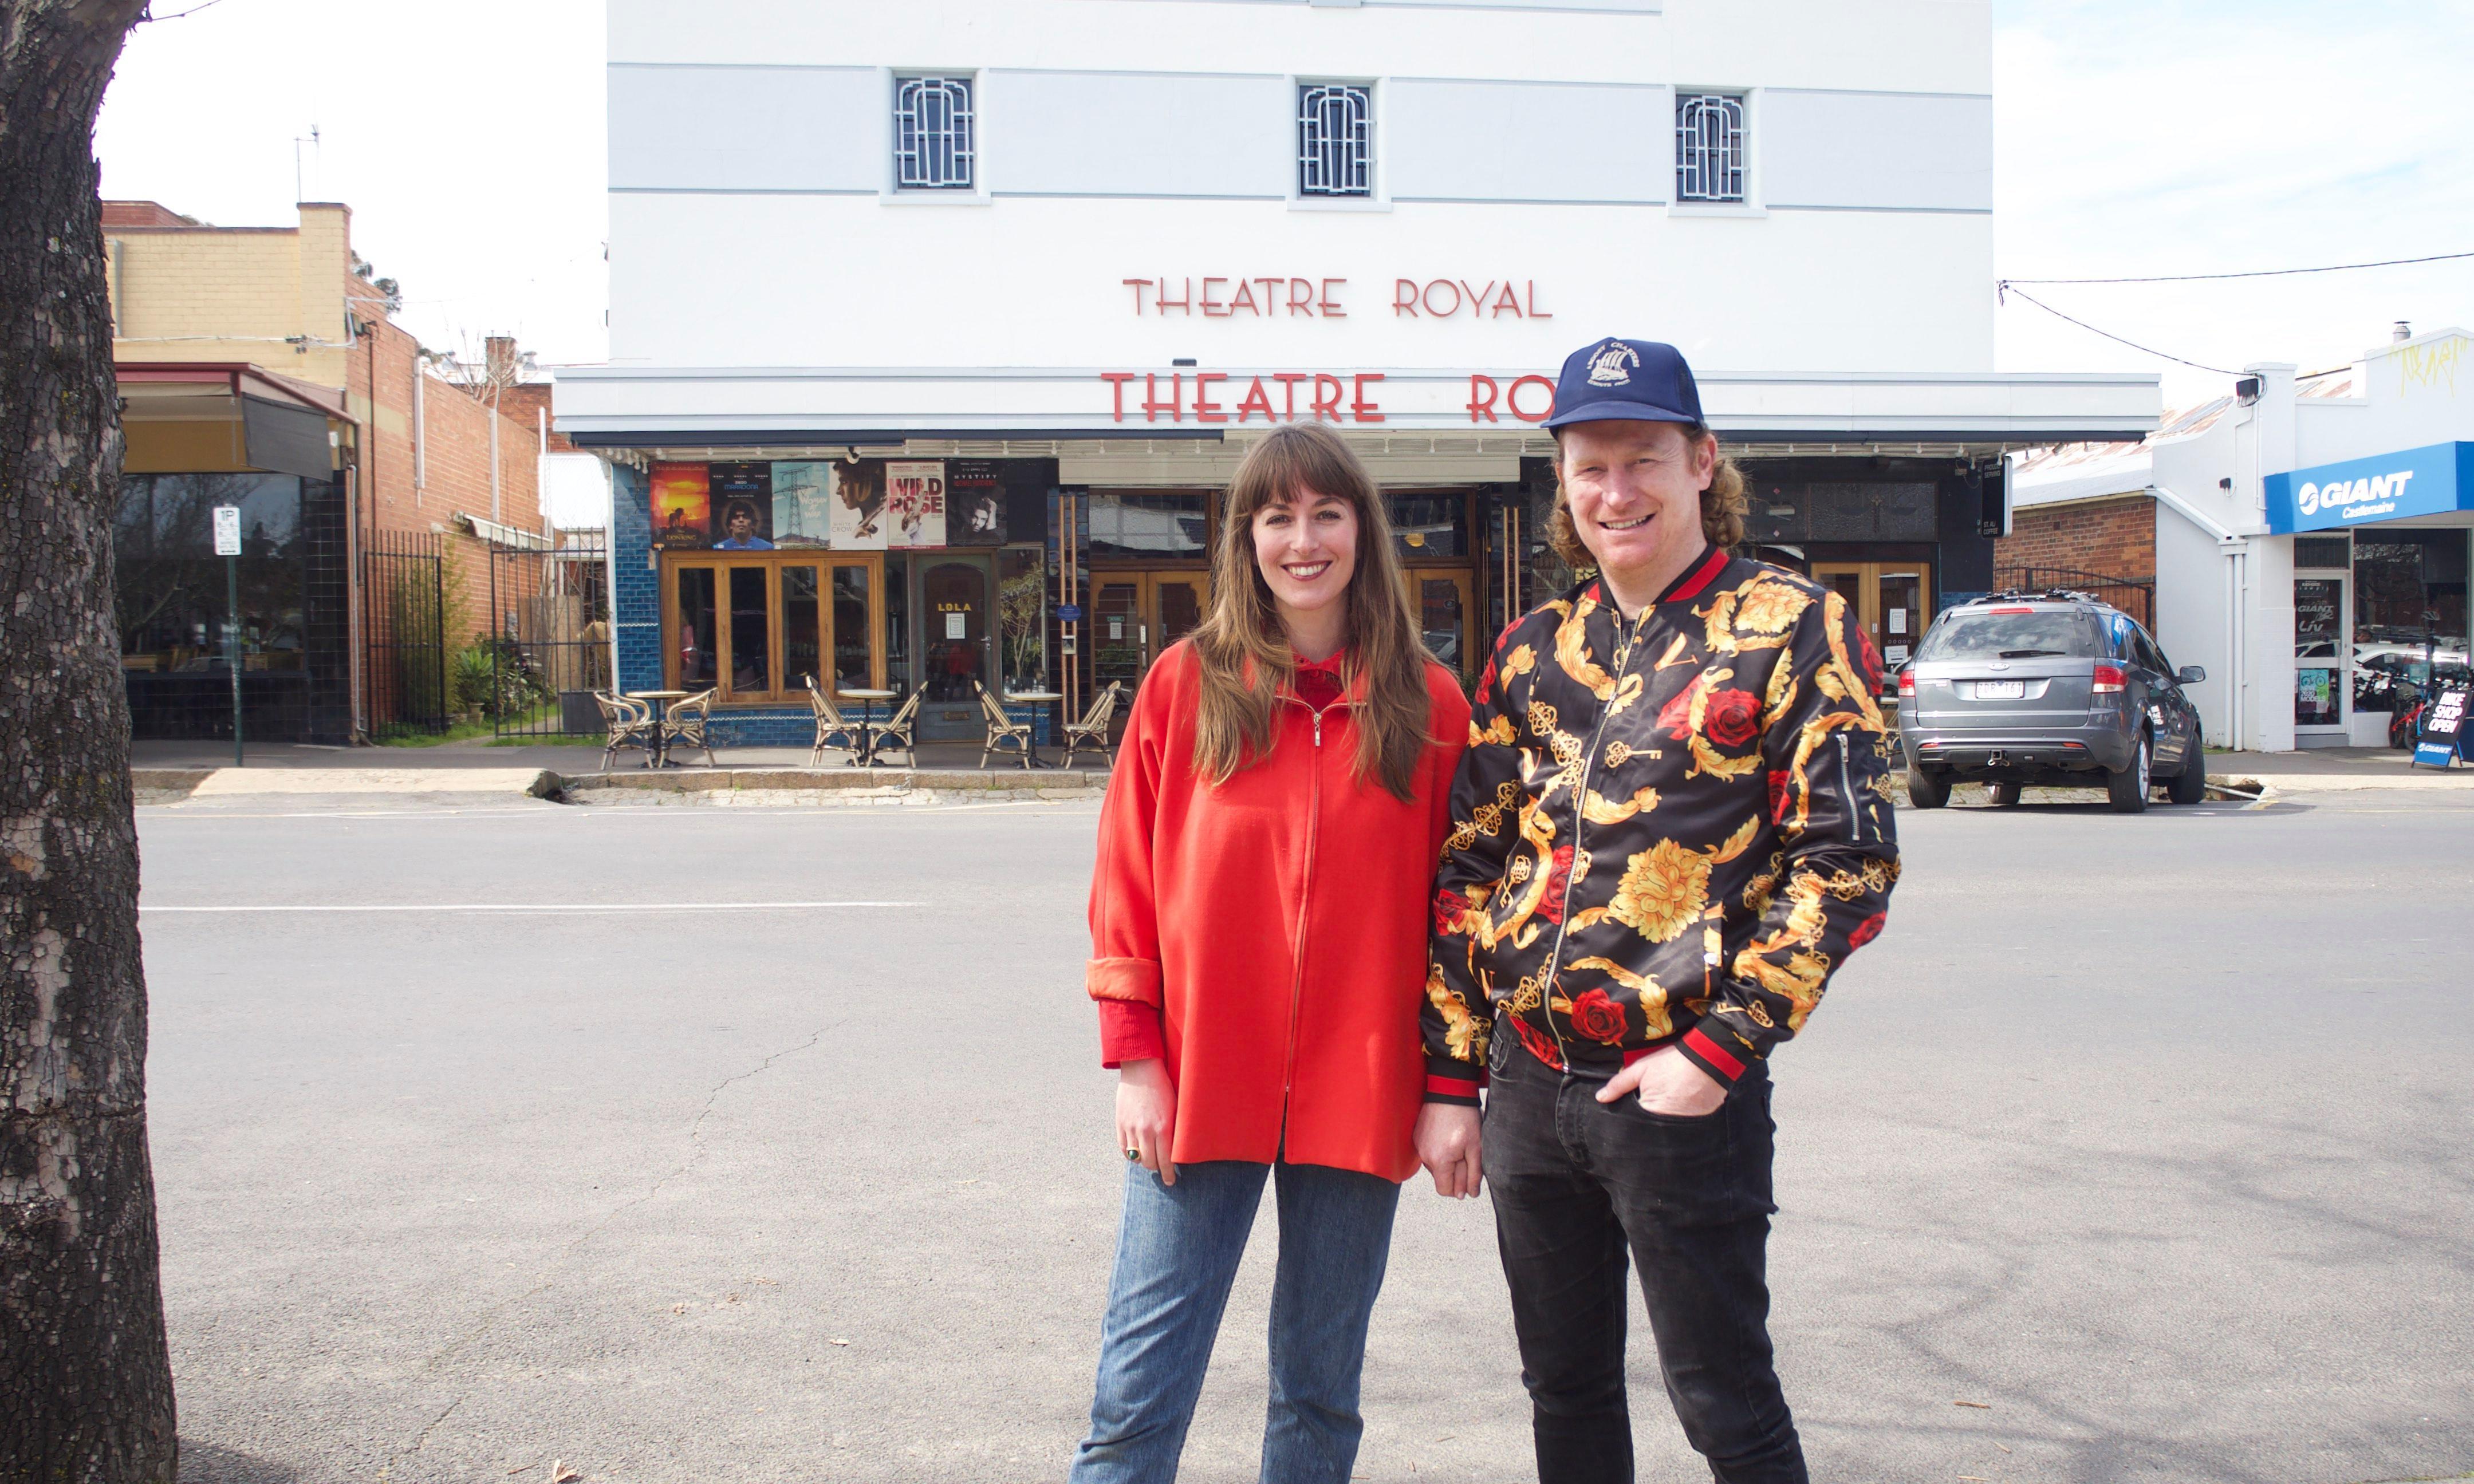 'The glue that ties communities': why regional venues are vital